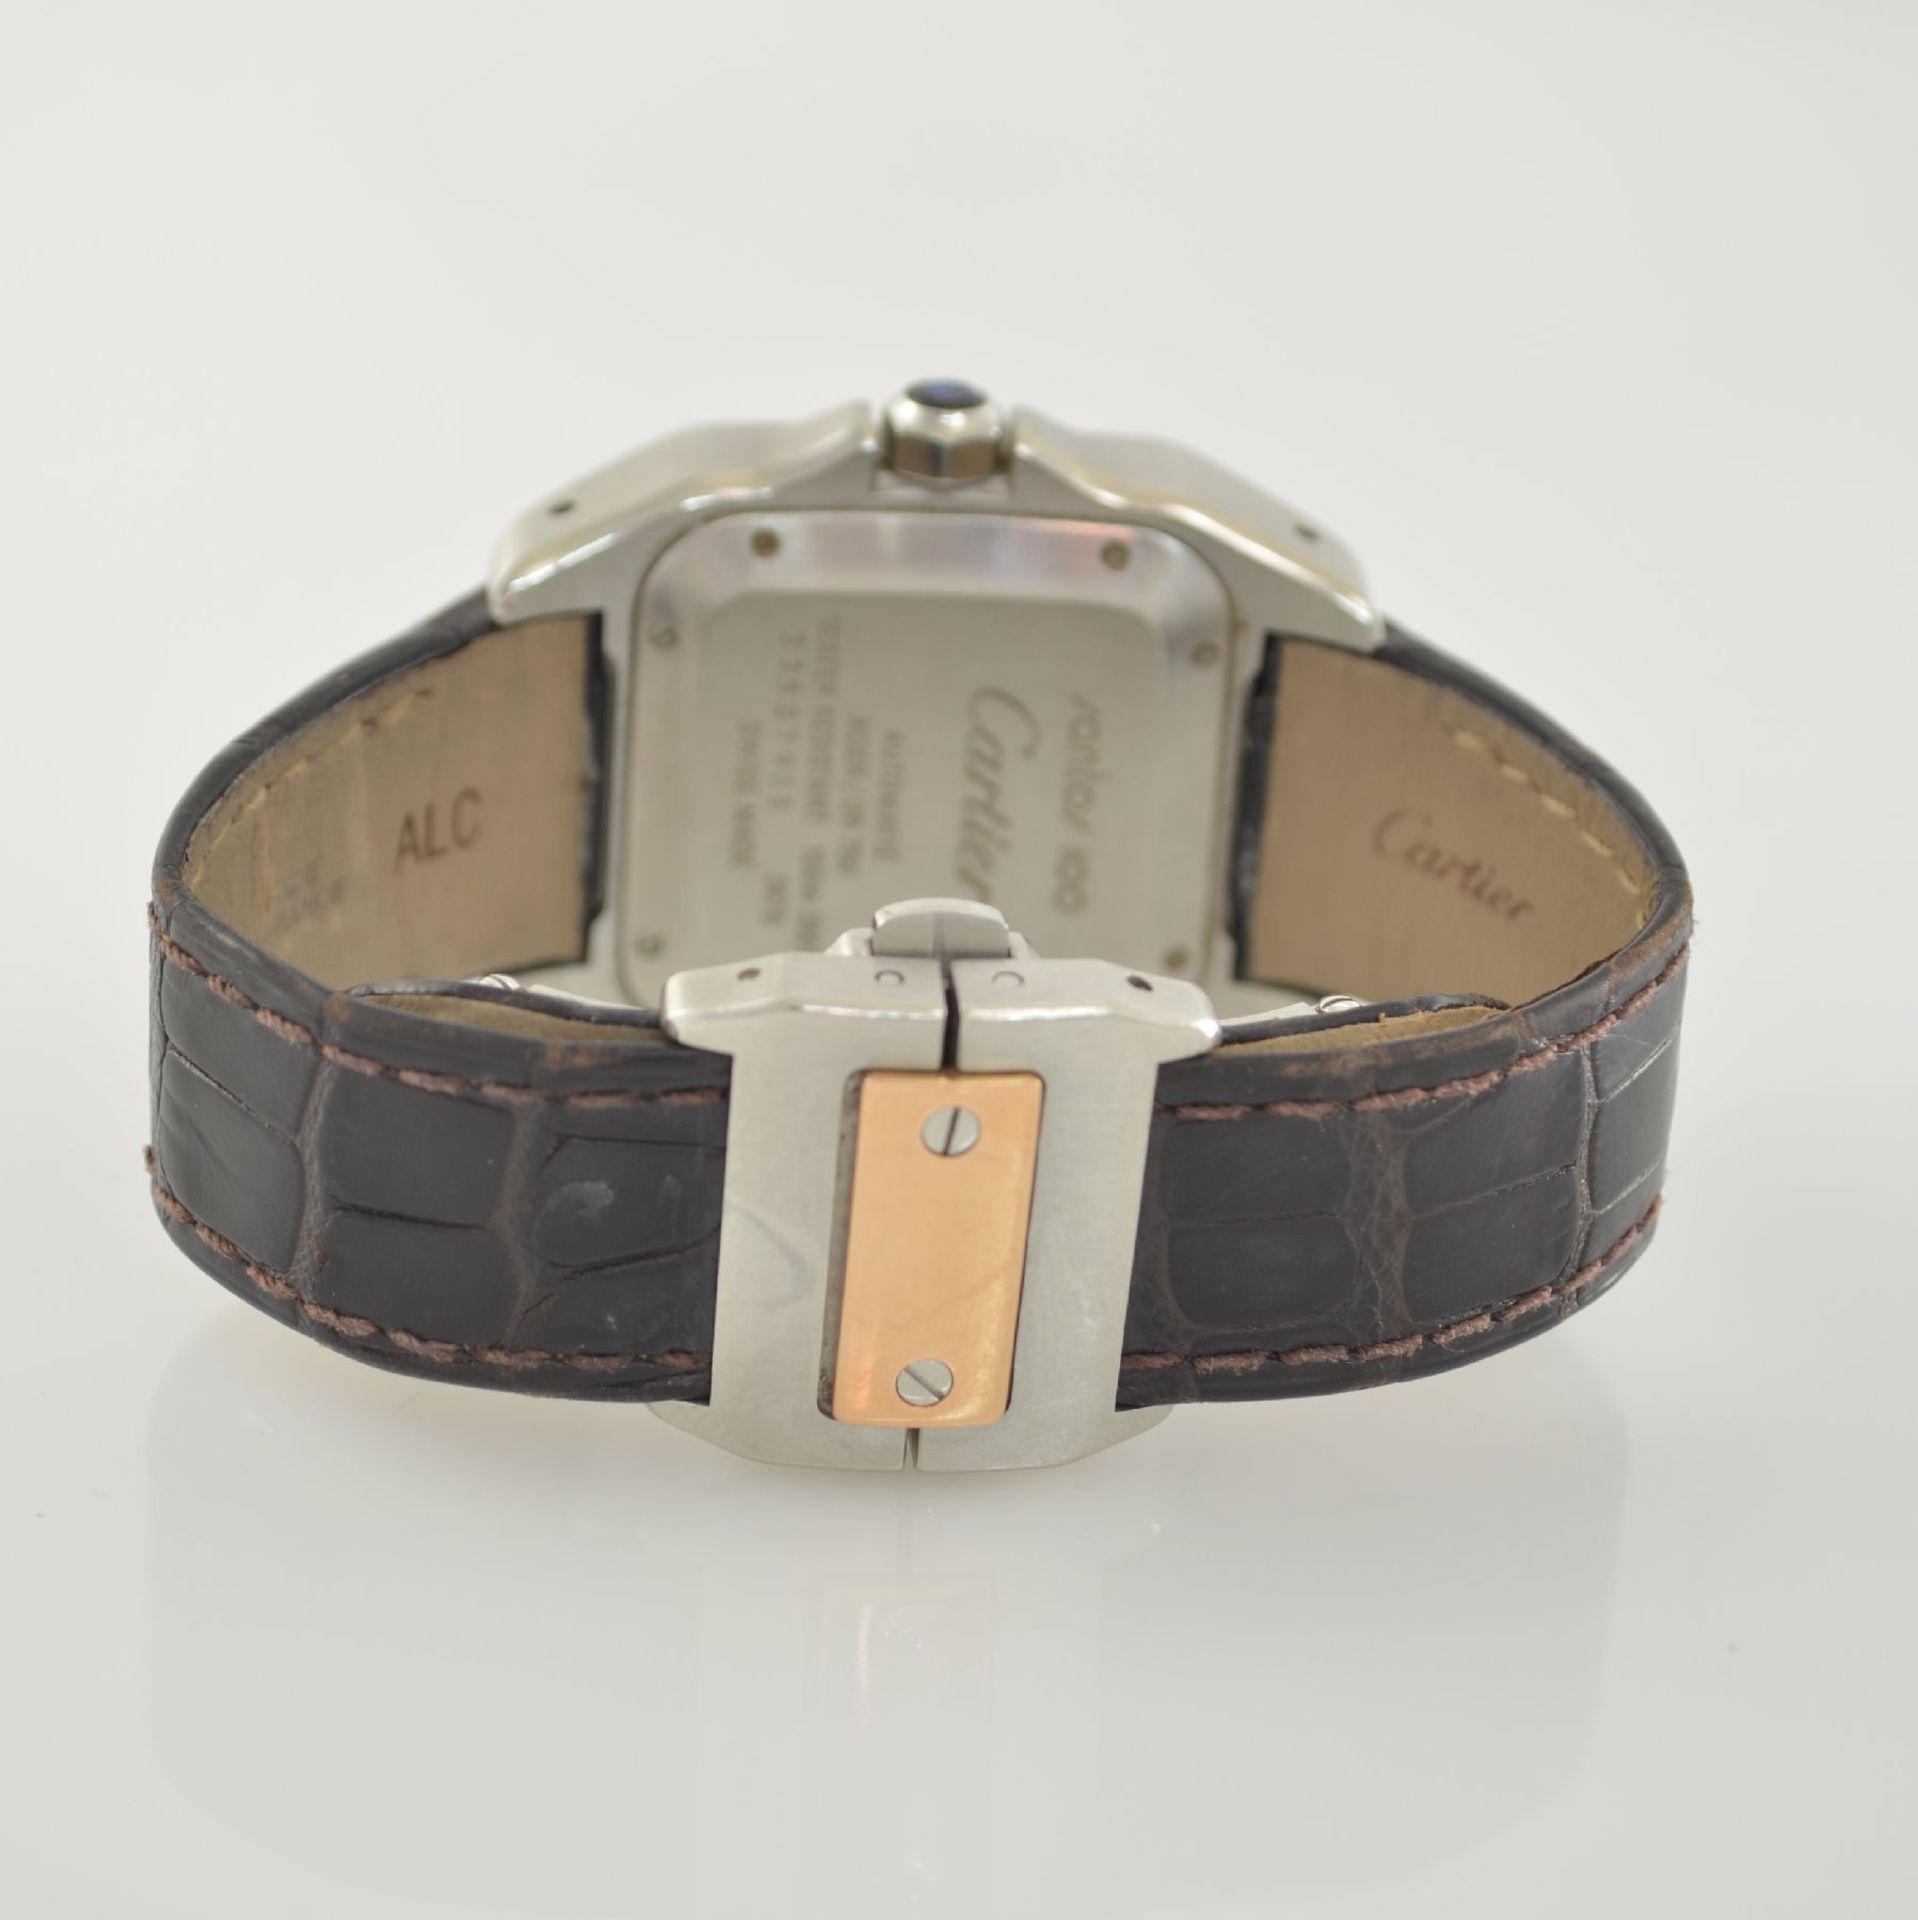 CARTIER Santos 100 Armbanduhr in Edelstahl & RoseG 750/000, Schweiz um 2006, Automatik, Boden 8-fach - Bild 6 aus 7